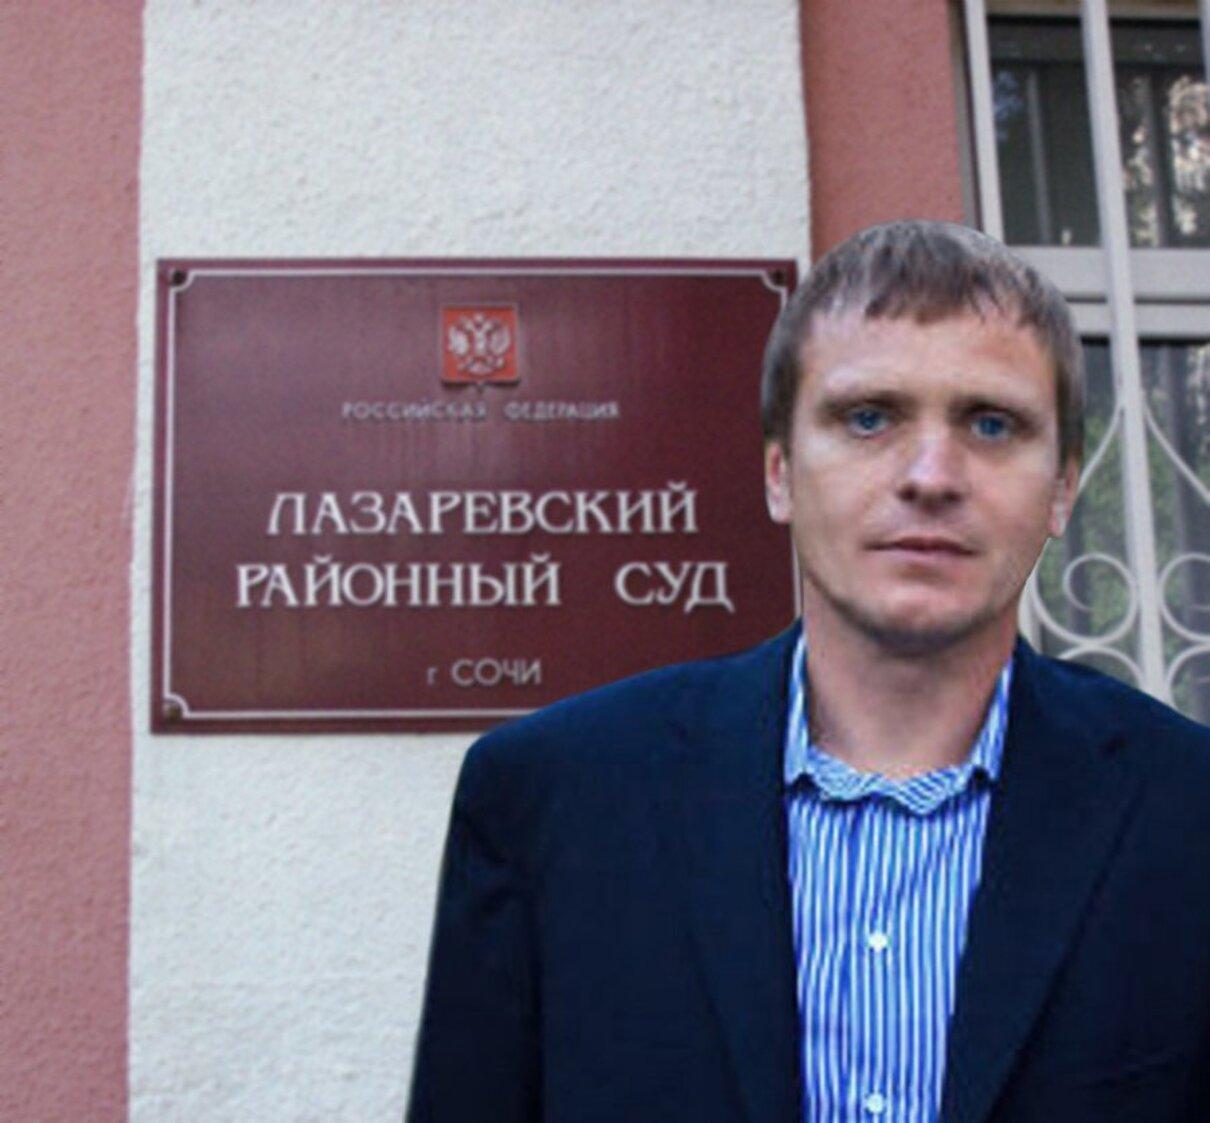 Жалоба-отзыв: Гарин Андрей Николаевич - Гарин Андрей Николаевич - аферист и мошенник!.  Фото №1